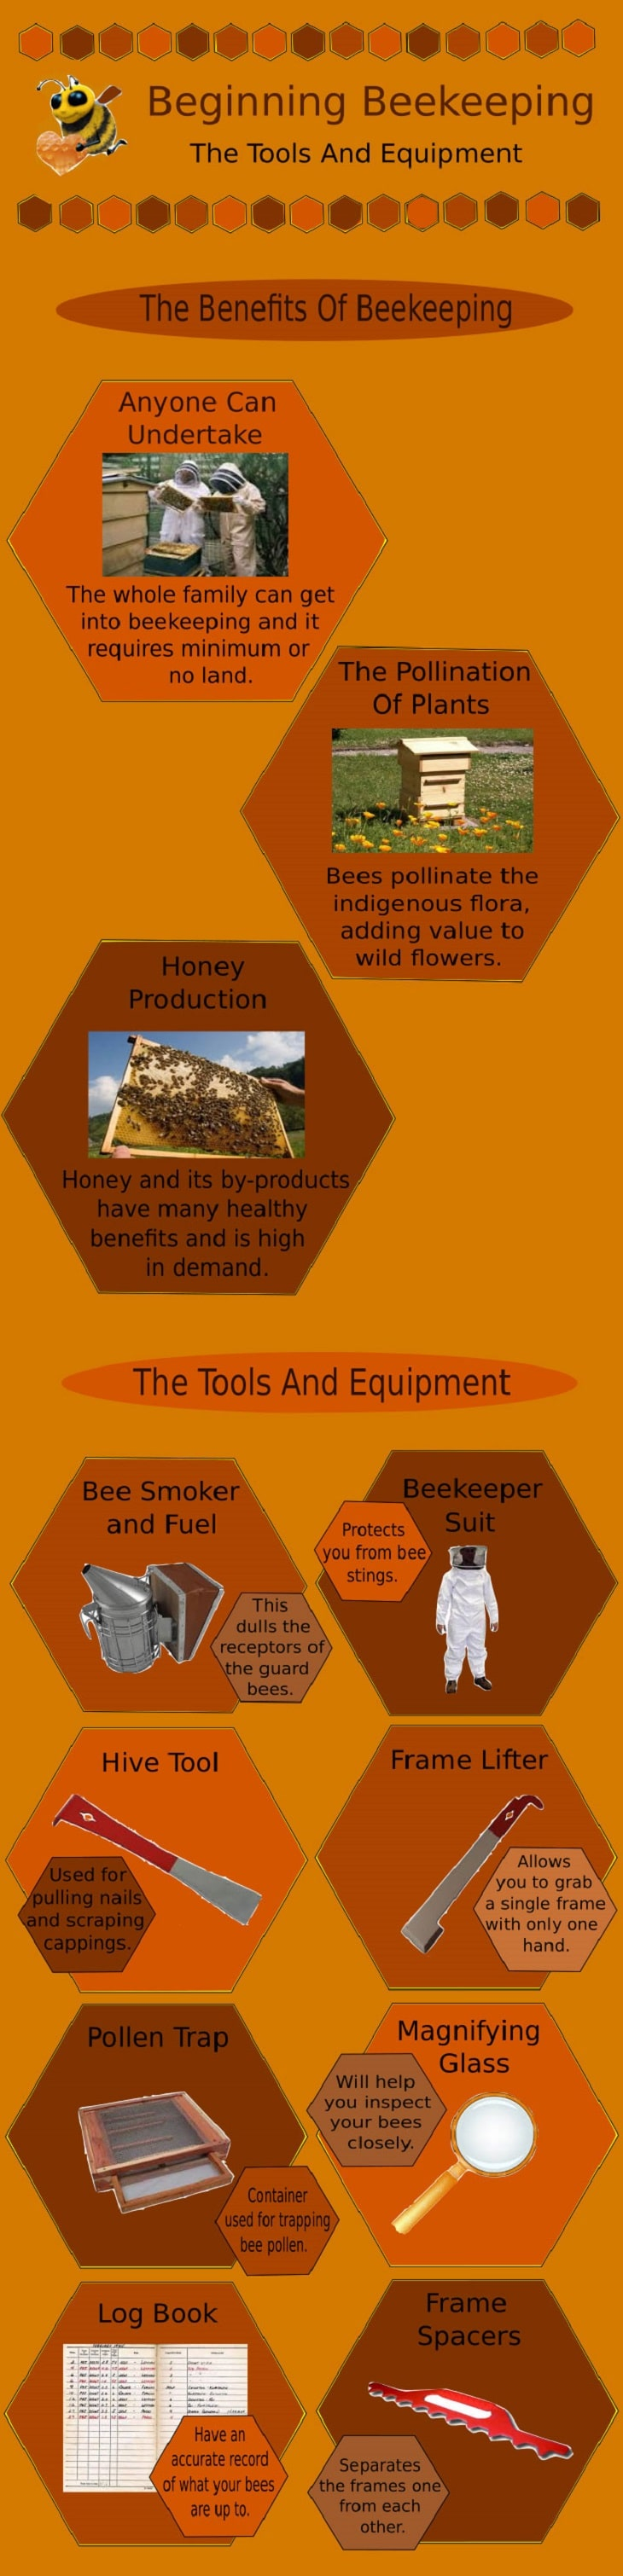 Beekeeping Infographic